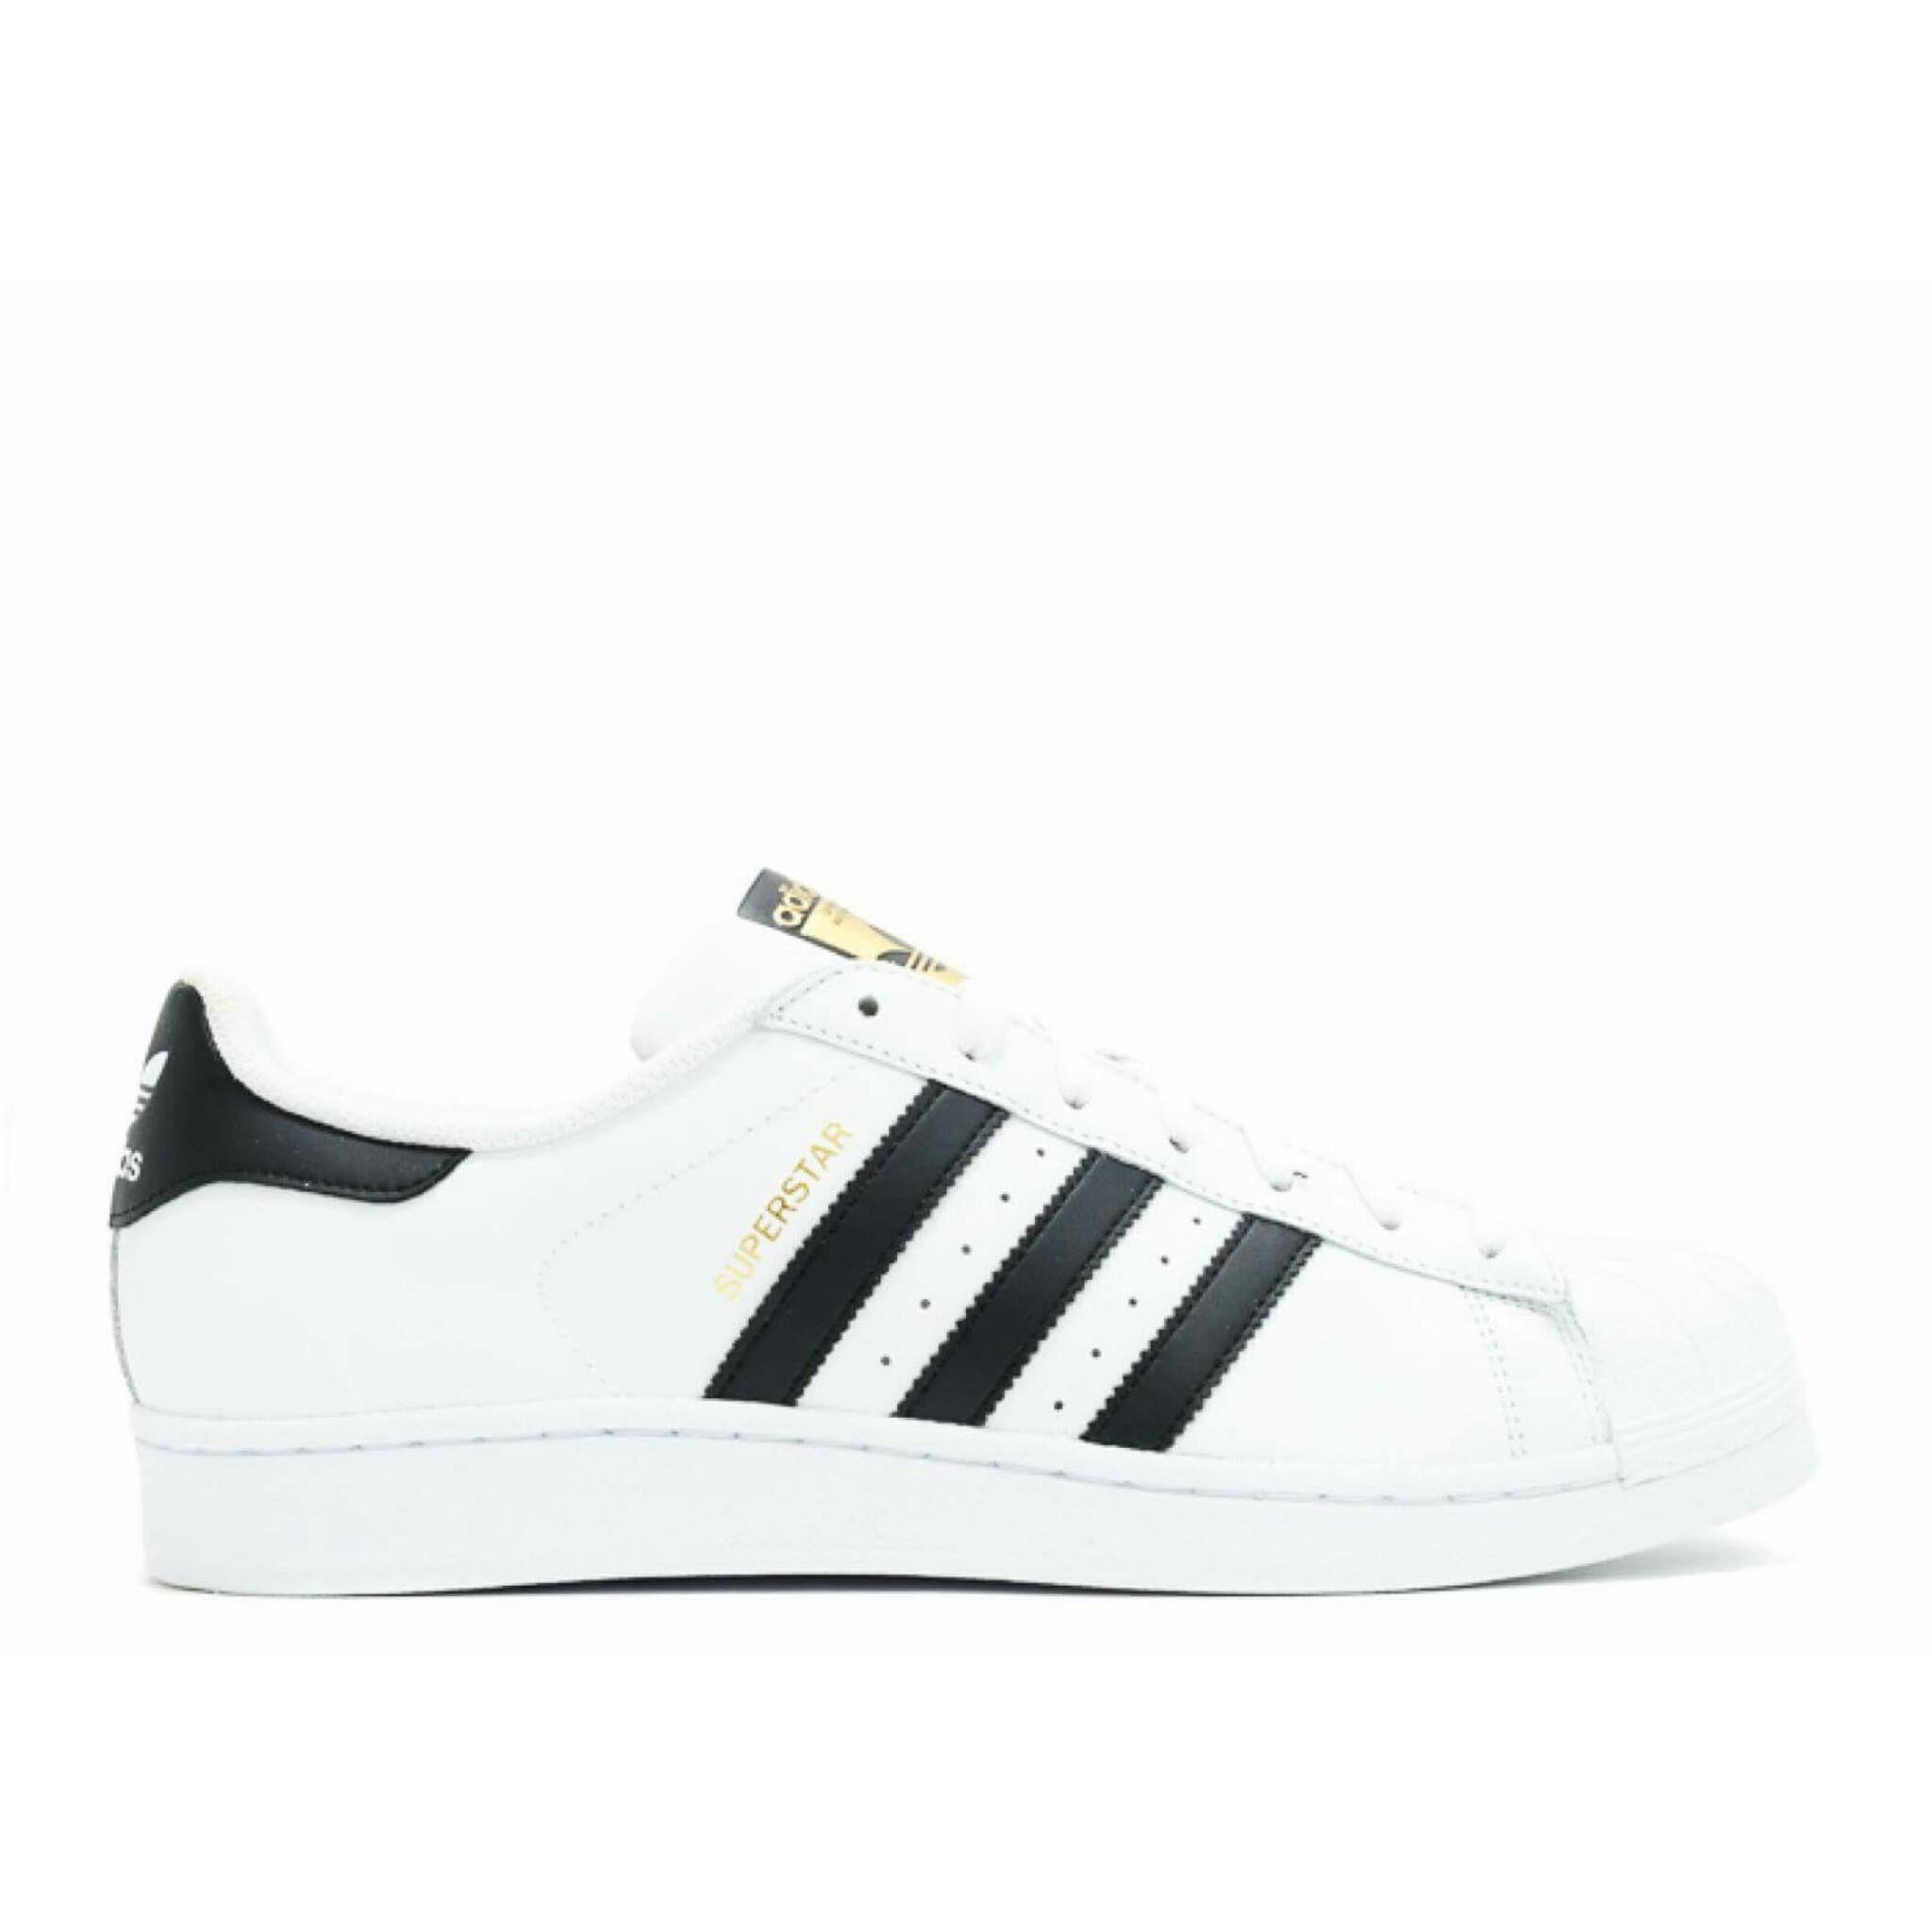 Adidas Superstar For Men White With Black Stripes